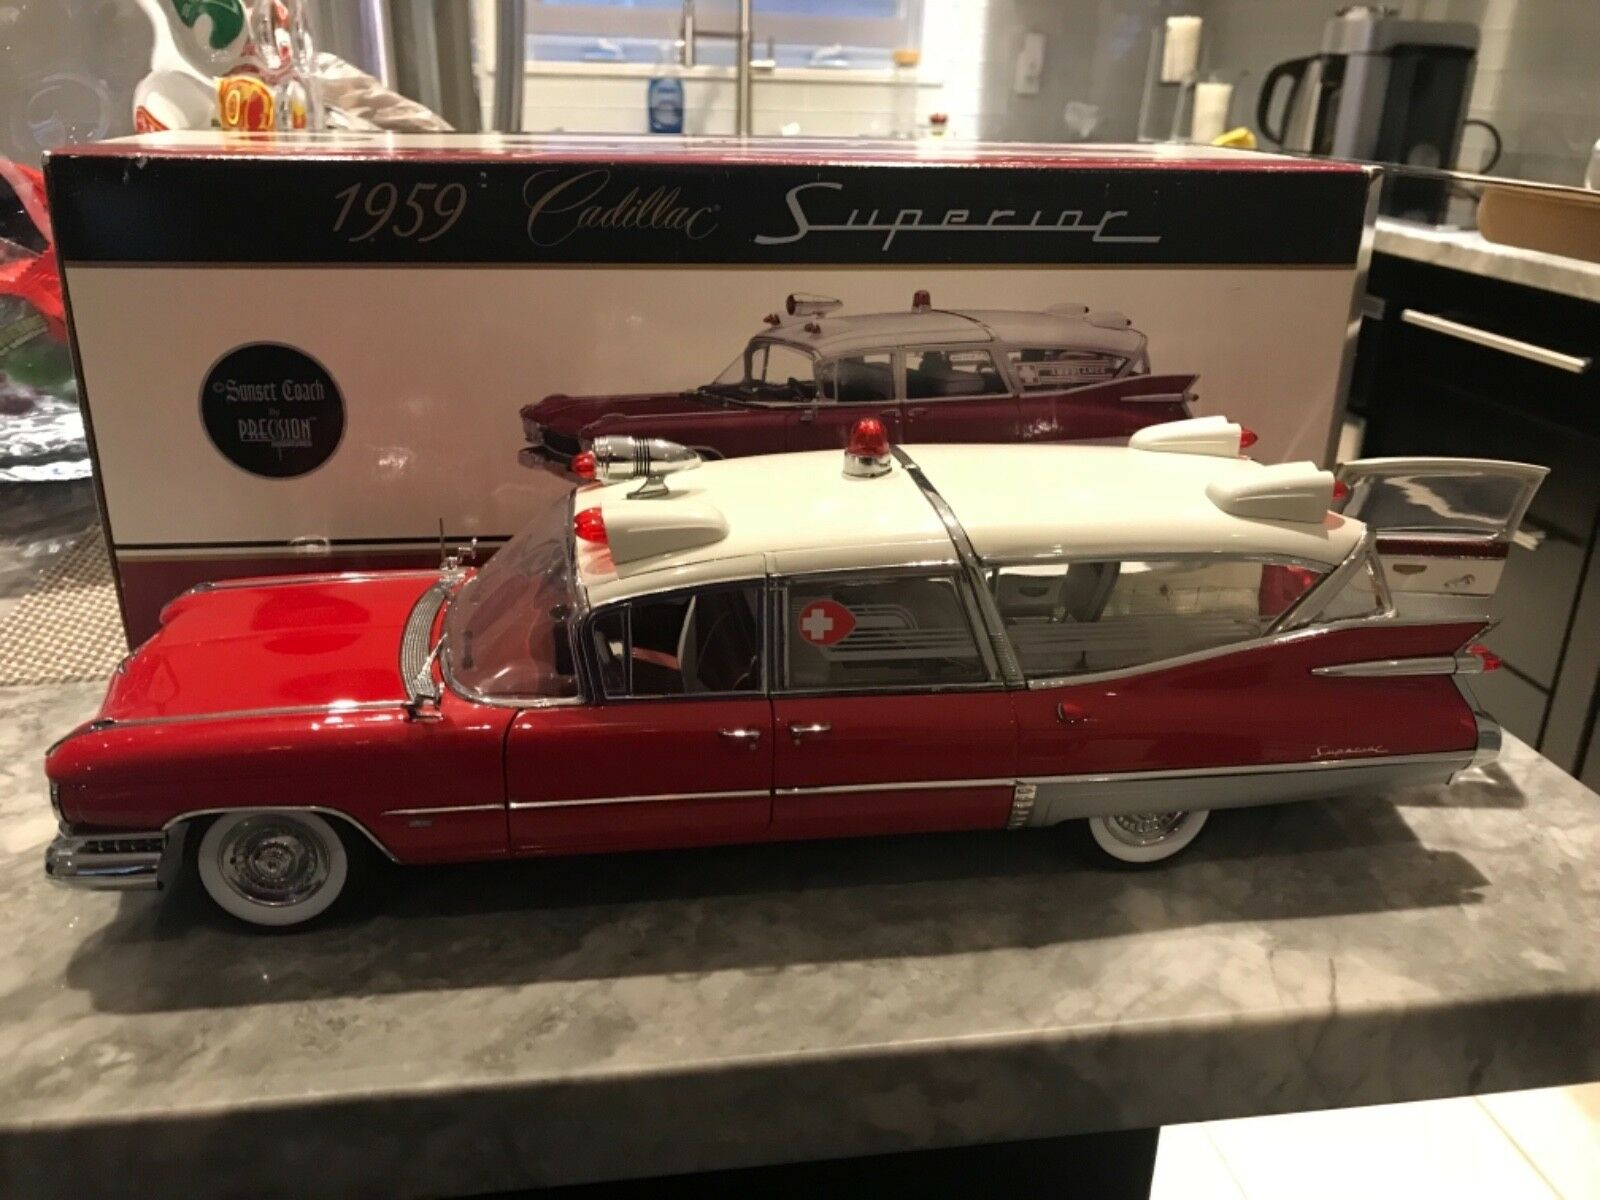 1 18 PRECISION MINIATURES''59 Cadillac Superior Crown Royale Ambulance blanco rojo